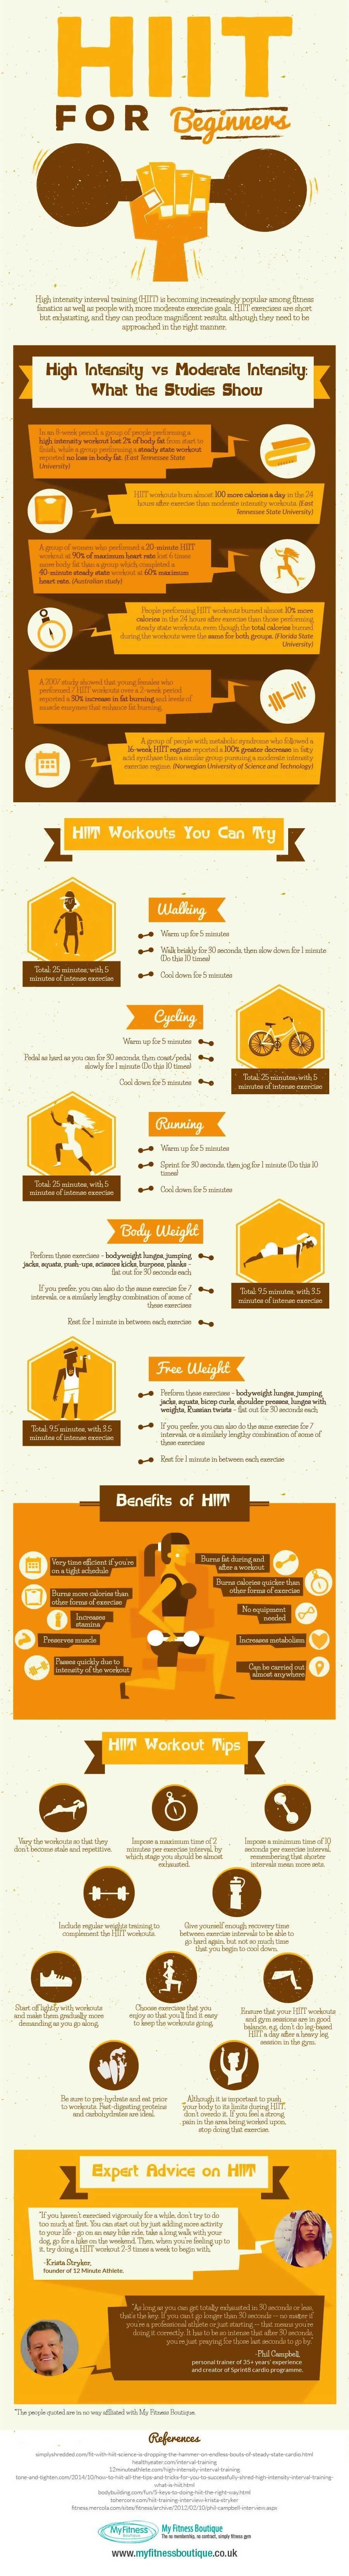 High Intensity Exercise Best For Heart Health